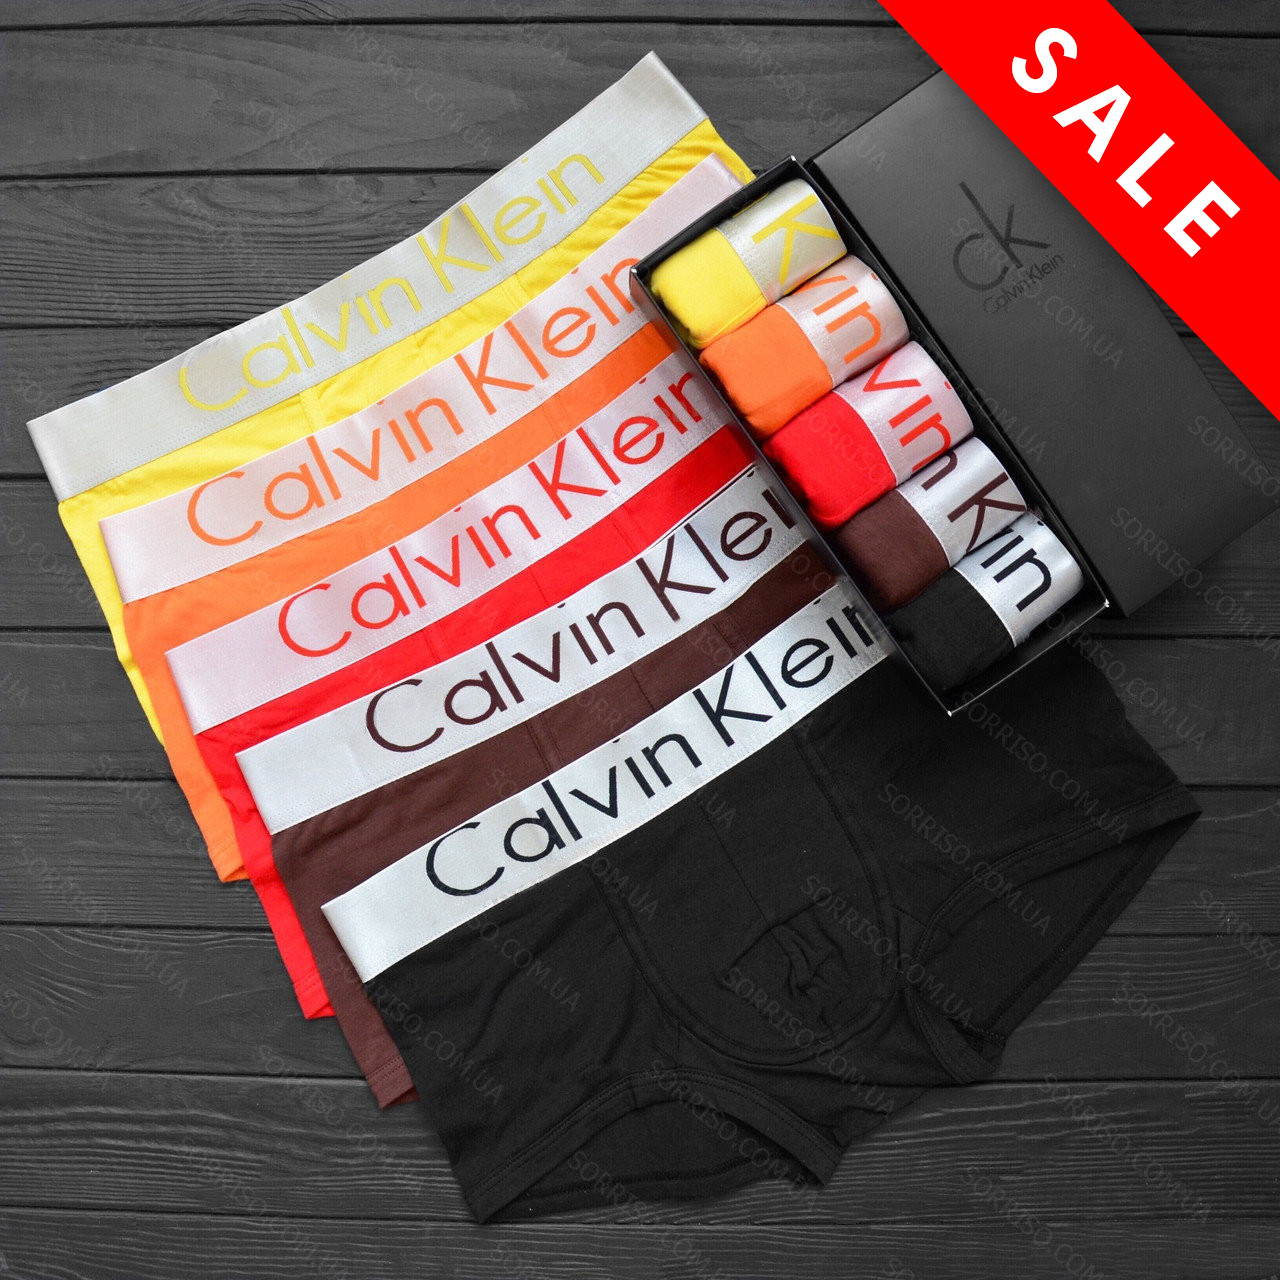 600e3853b77e6 Calvin Klein Набор 5 шт мужского нижнего белья Steel боксеры реплика -  Интернет-магазин «